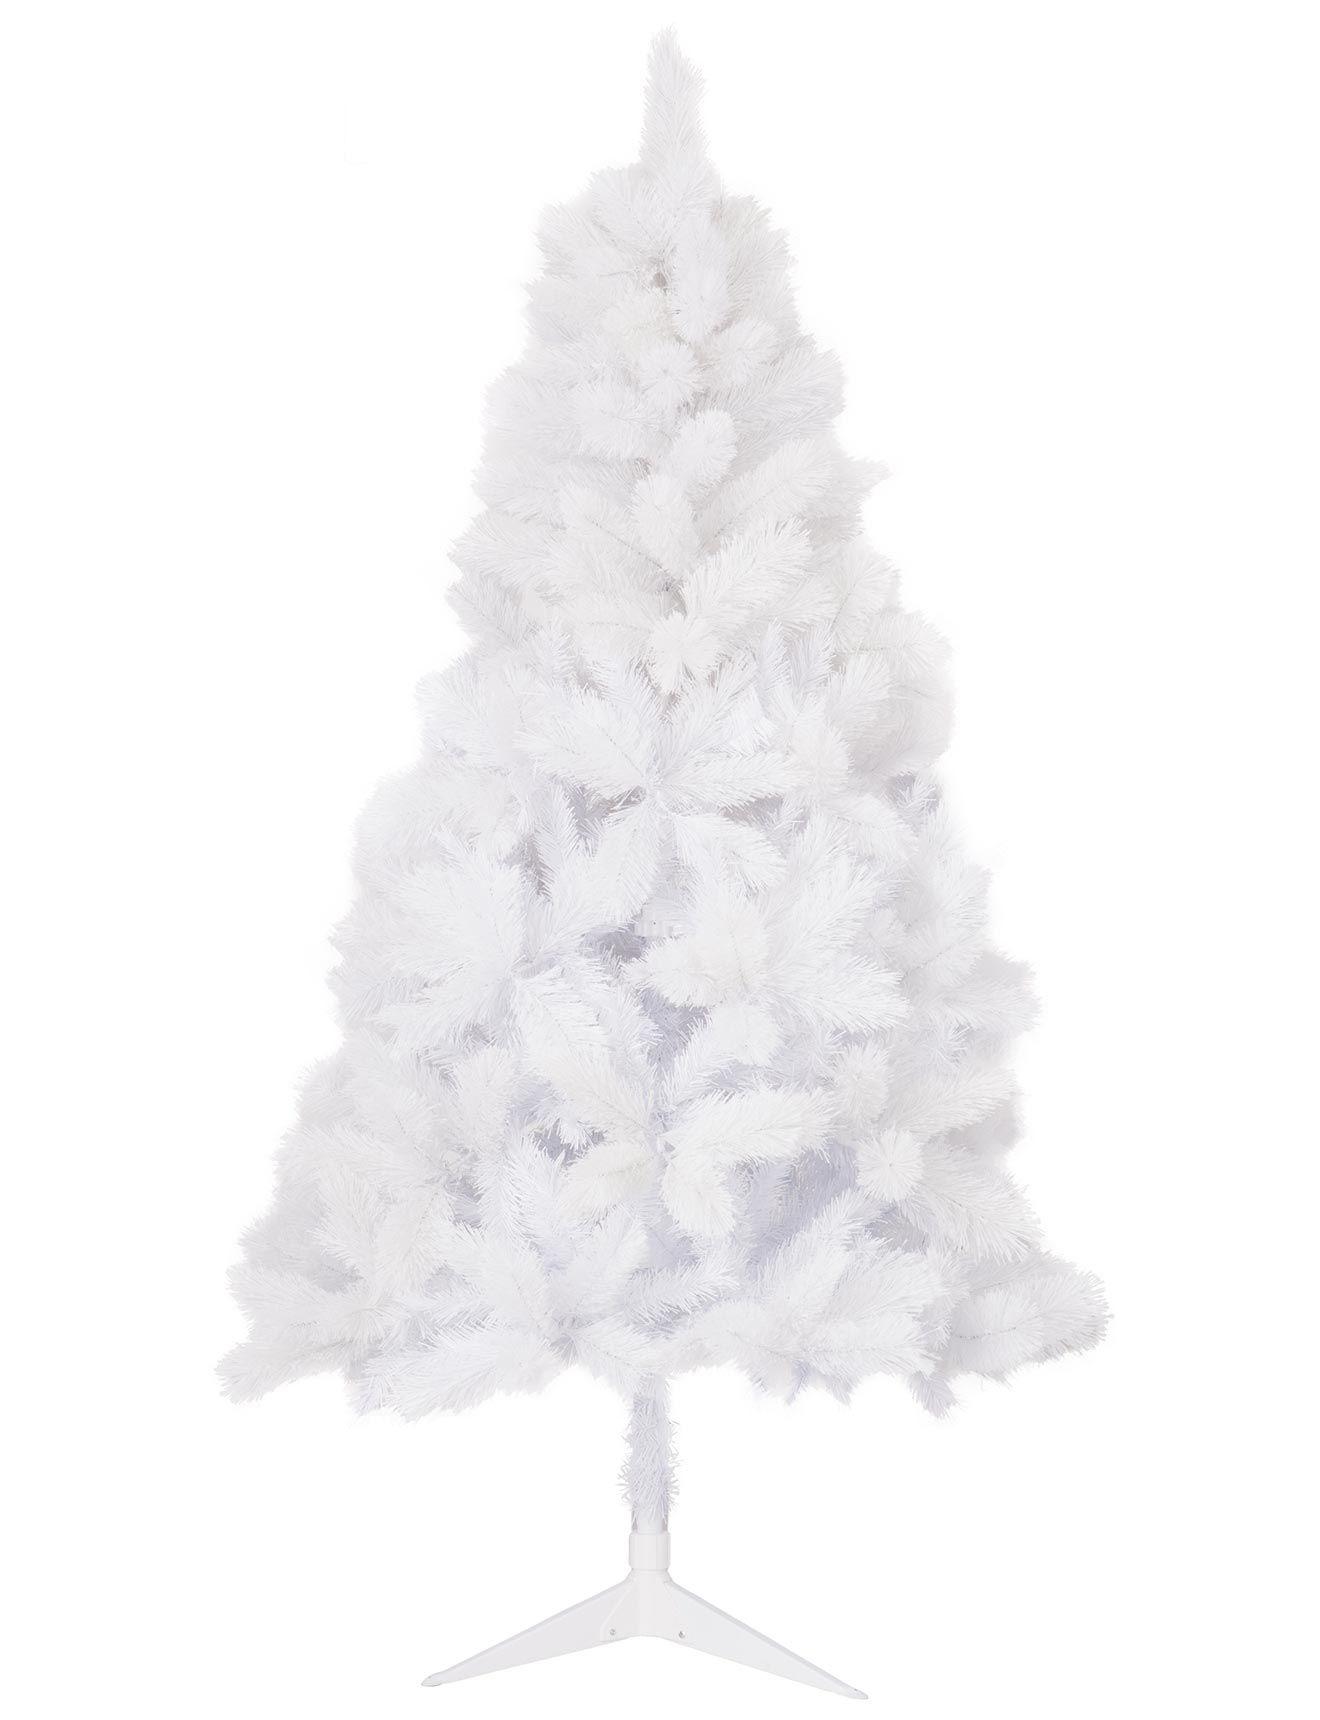 David Jones Home White Cashmere 6 5 198cm Christmas Tree At David Jones Store Fashion Online Shop David Jones White Cashmere